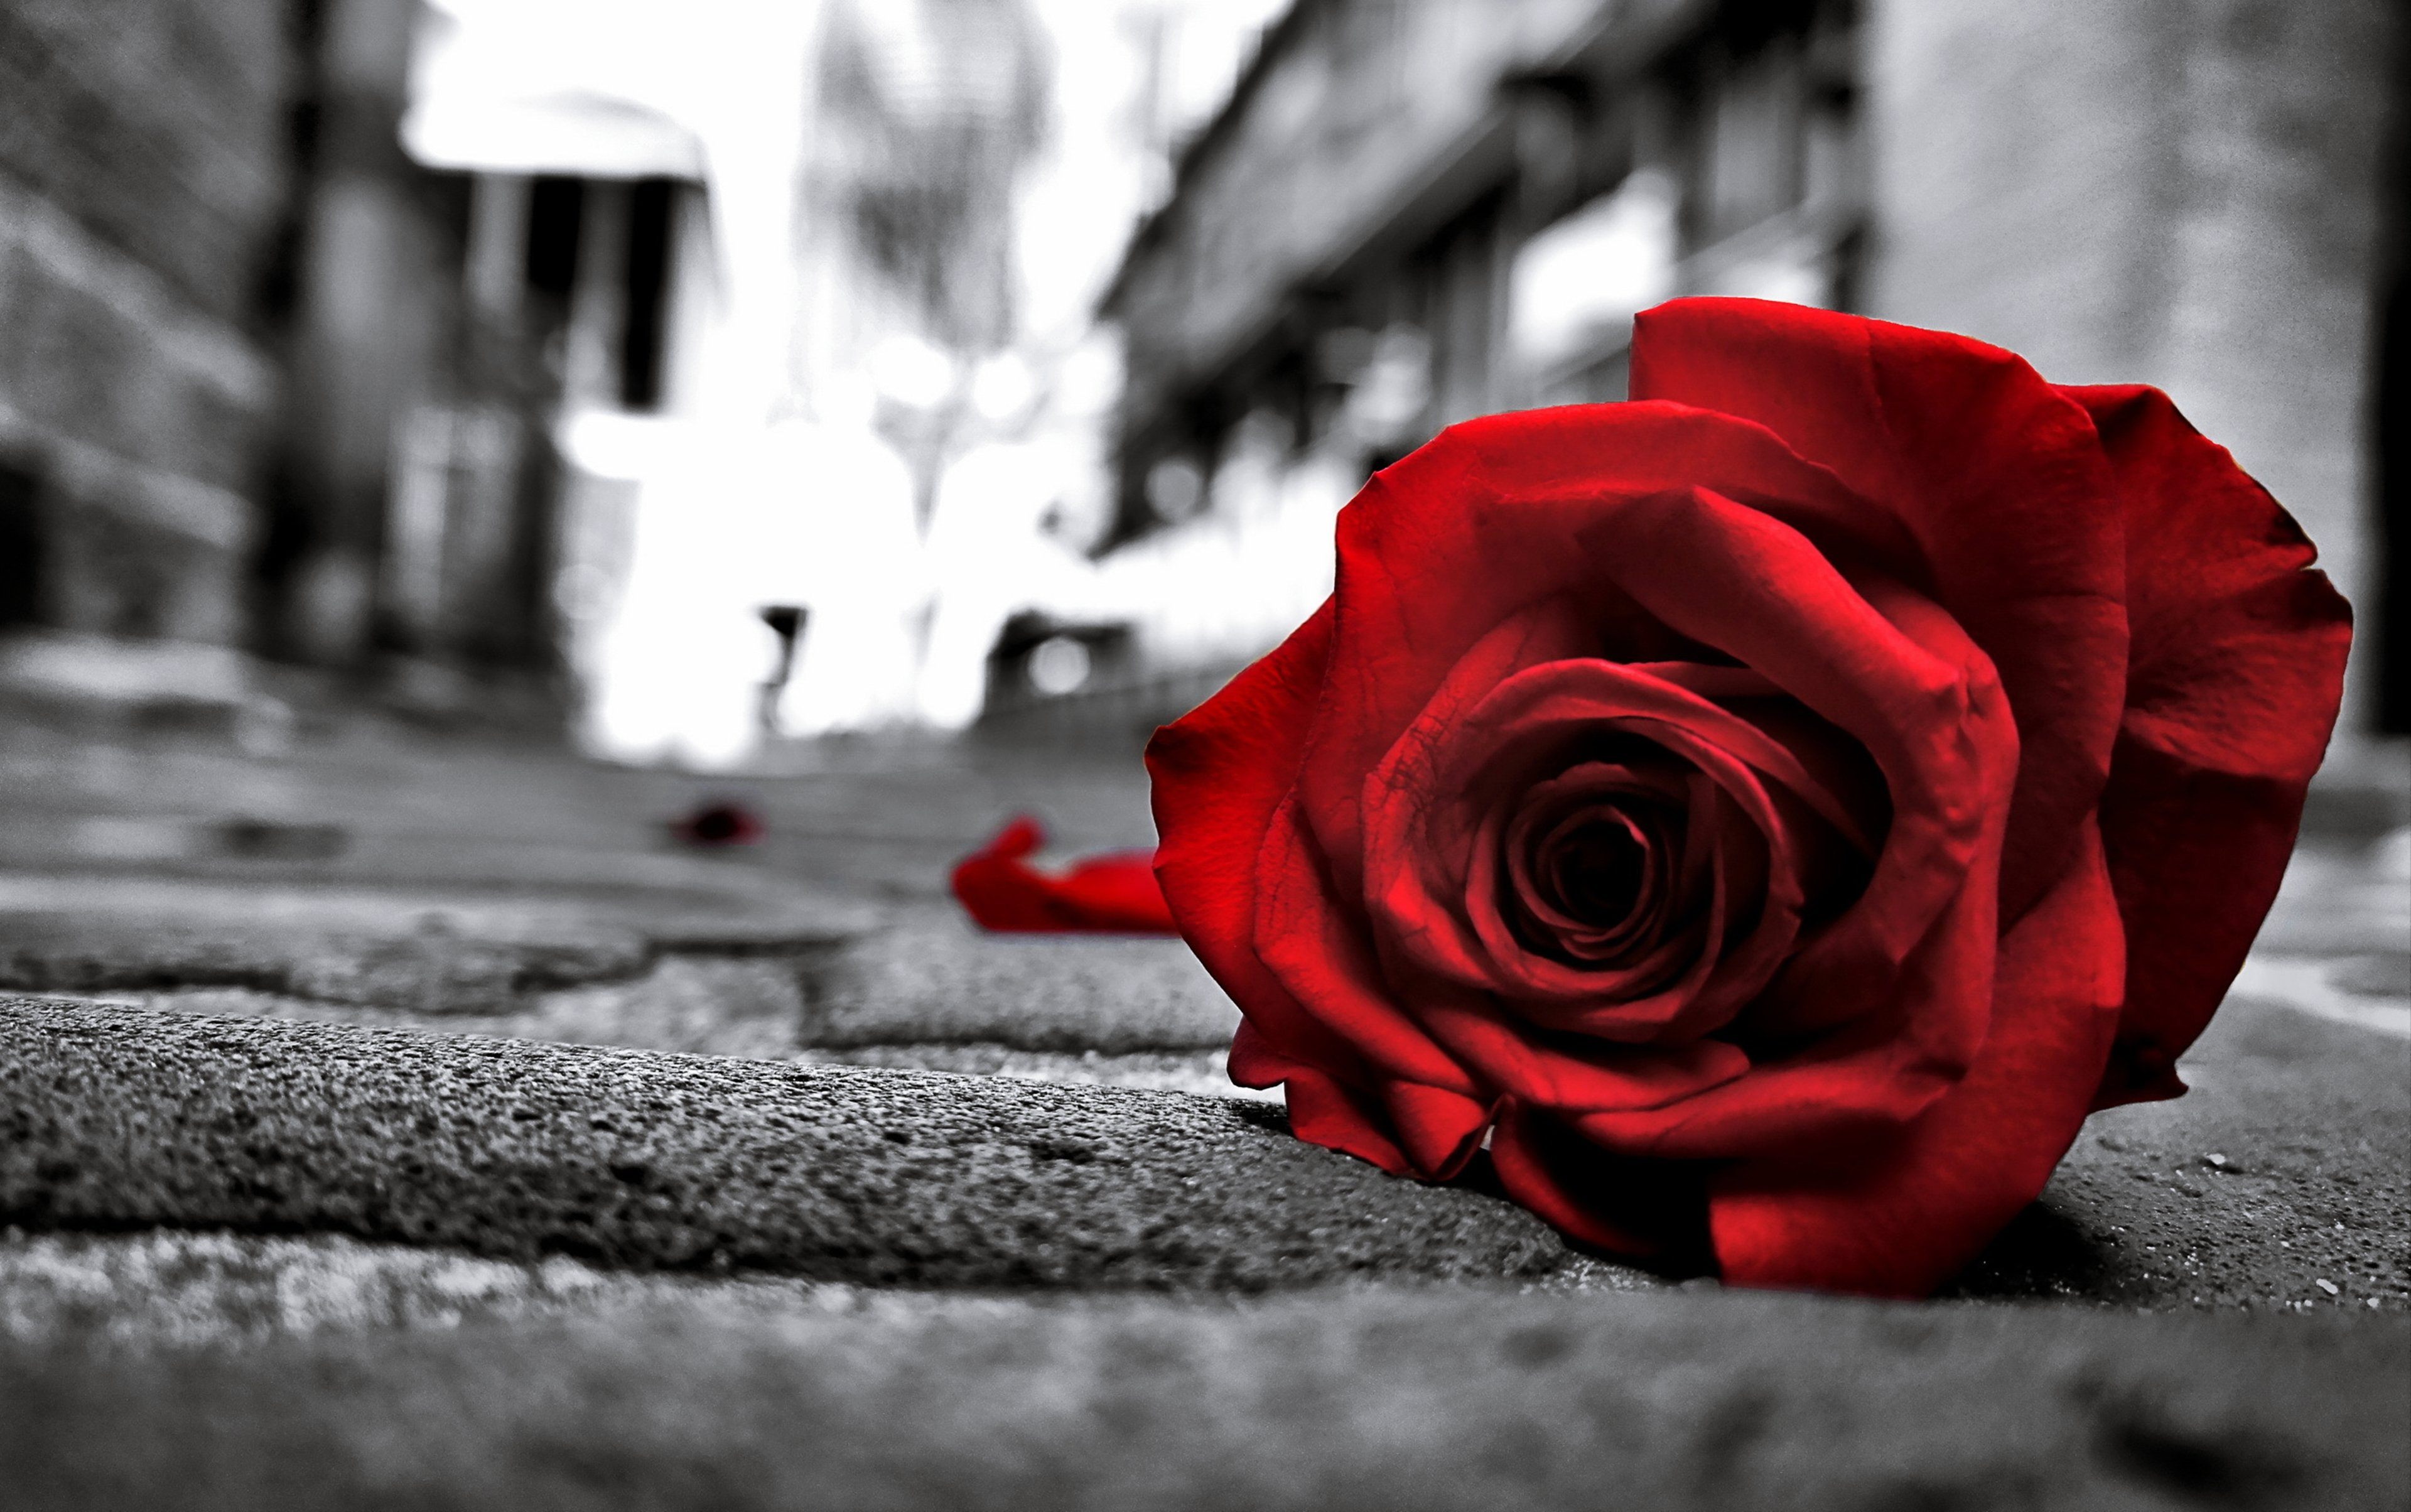 Love N Emotional Wallpaper : Rose sad black lost love emotions flowers life road floor lonely wallpaper 3840x2408 619505 ...